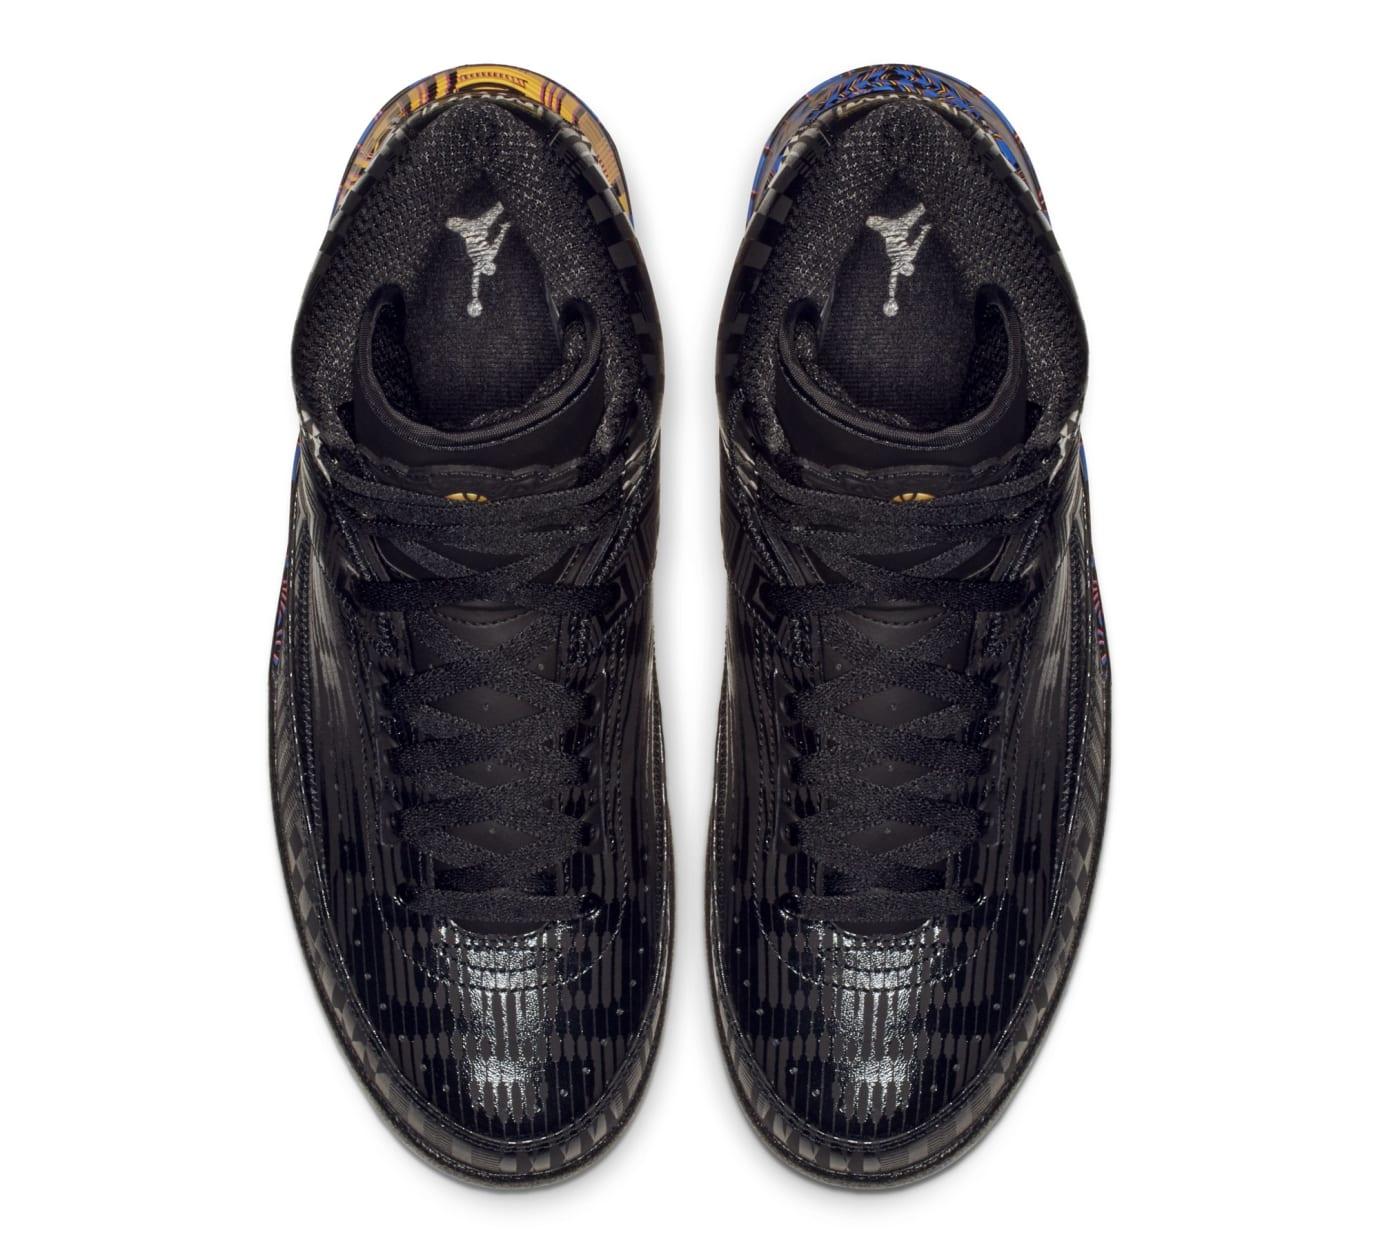 551a442b050669 Image via Nike Air Jordan 2  BHM  BQ7618-007 (Top)